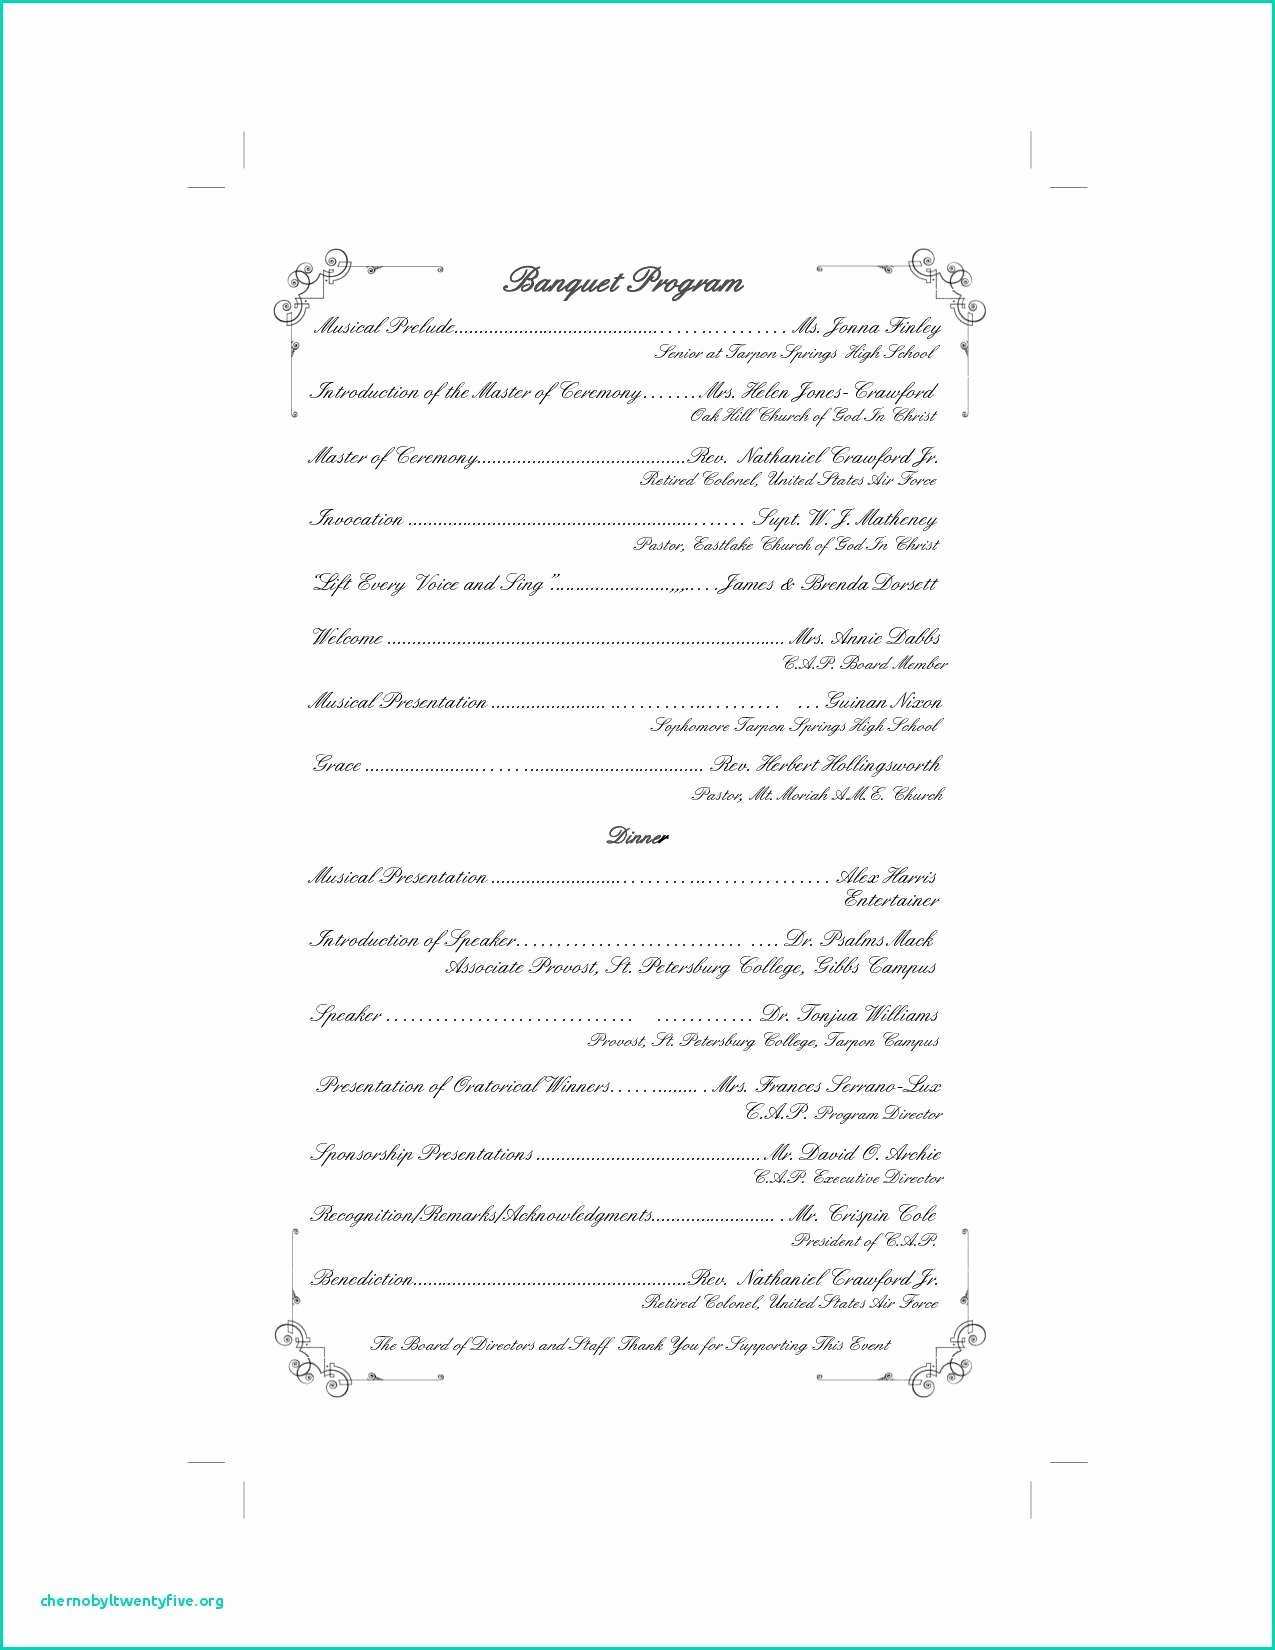 Family Reunion Program Template Luxury 44 Family Reunion Wel E Letter Examples